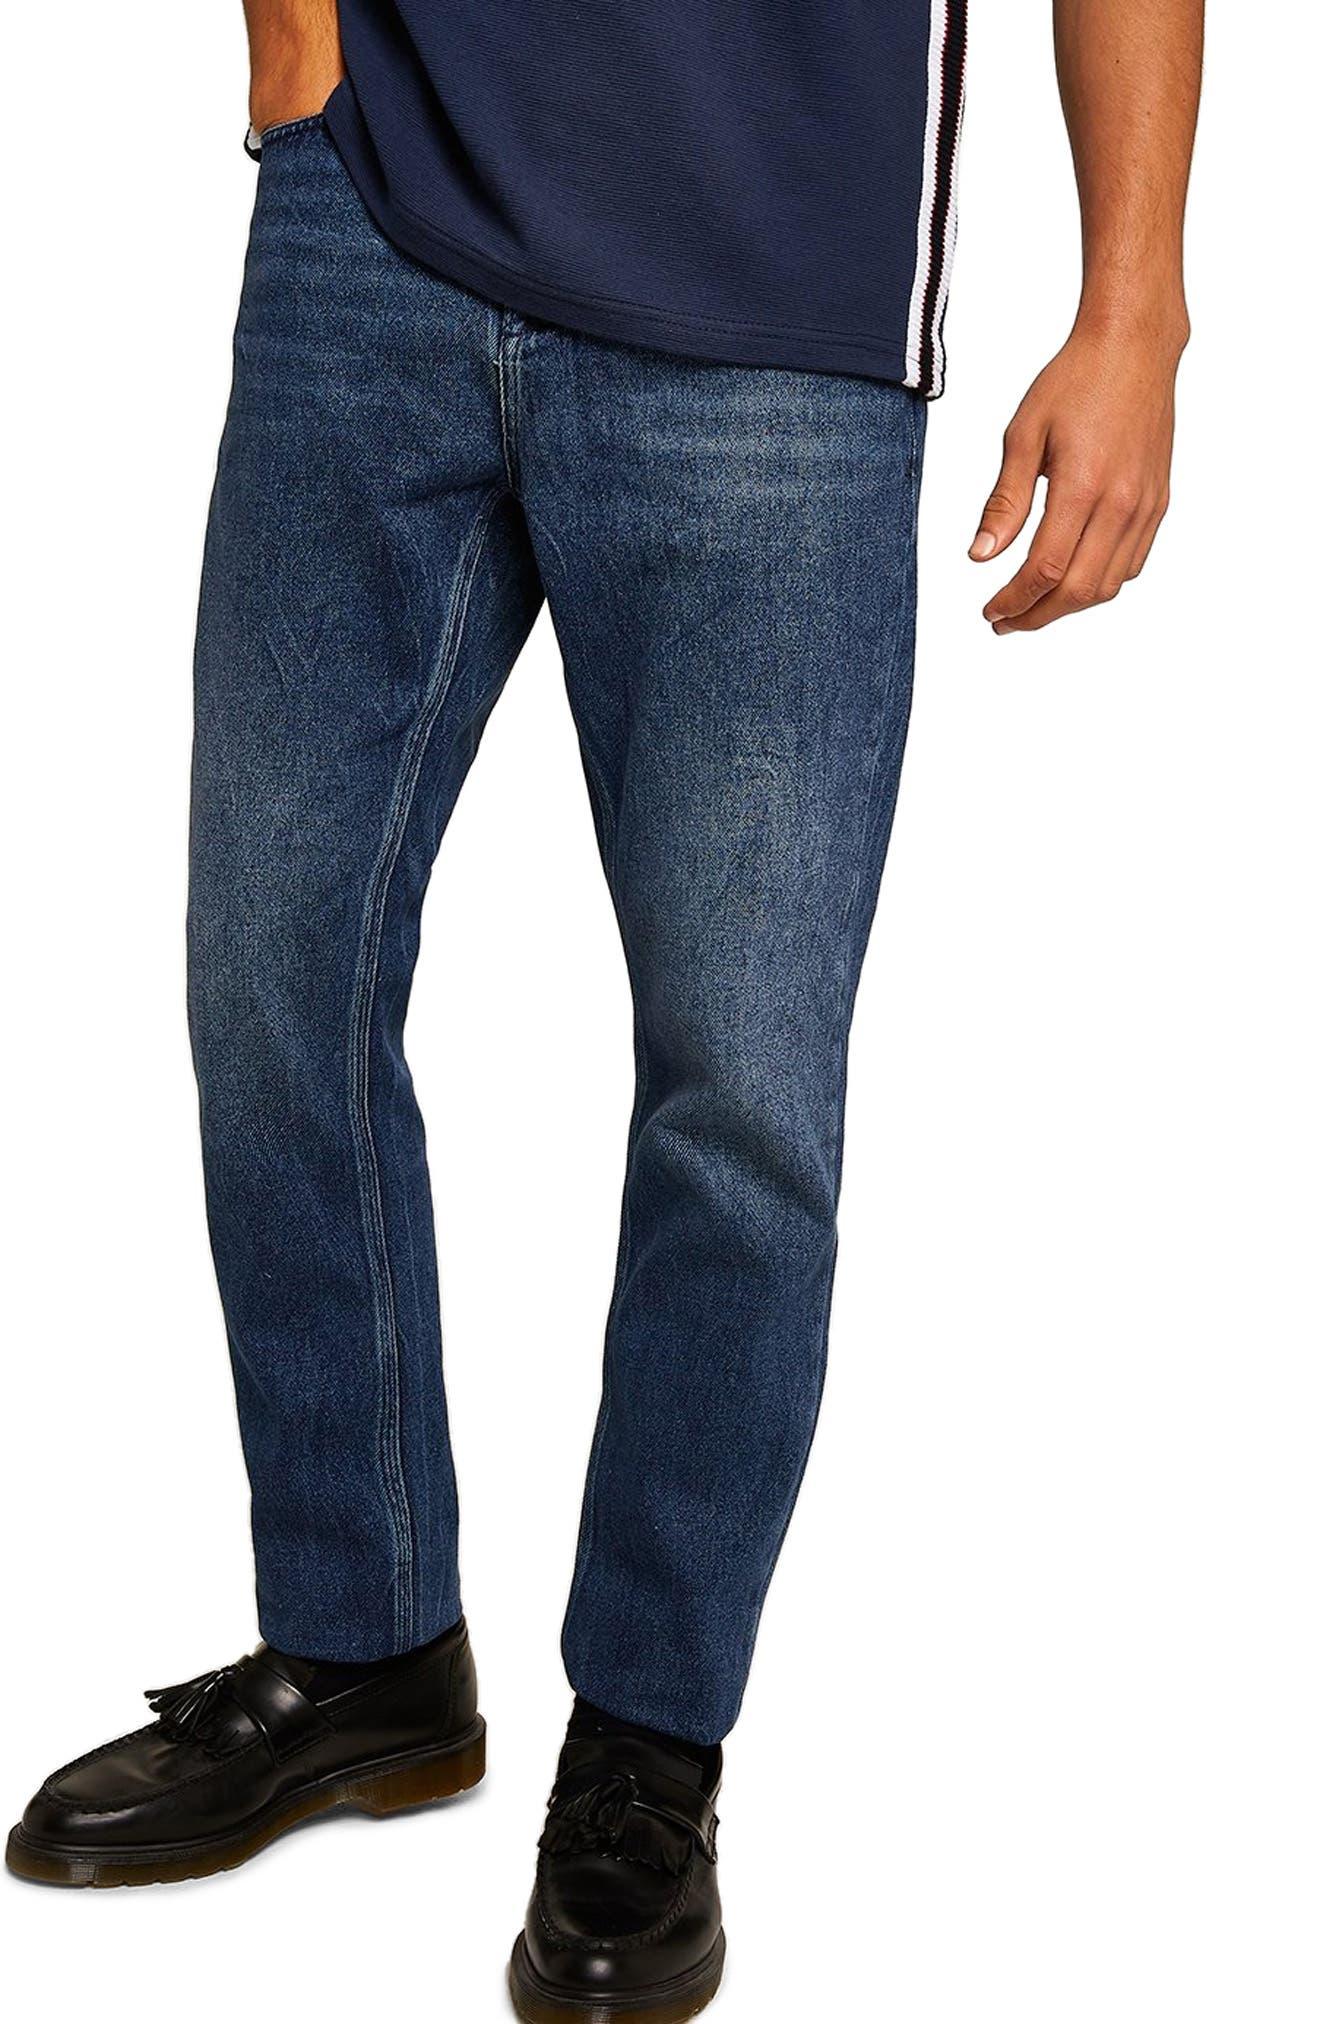 Cupid Rigid Taper Jeans,                         Main,                         color, DARK BLUE